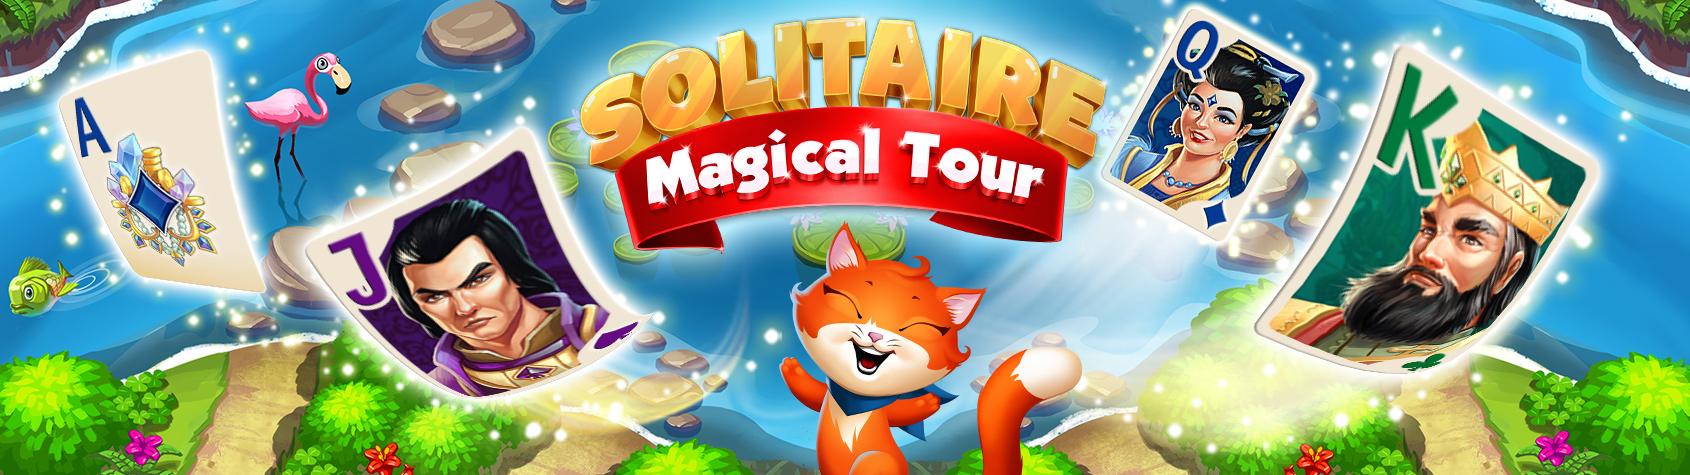 Solitaire Magical Tour